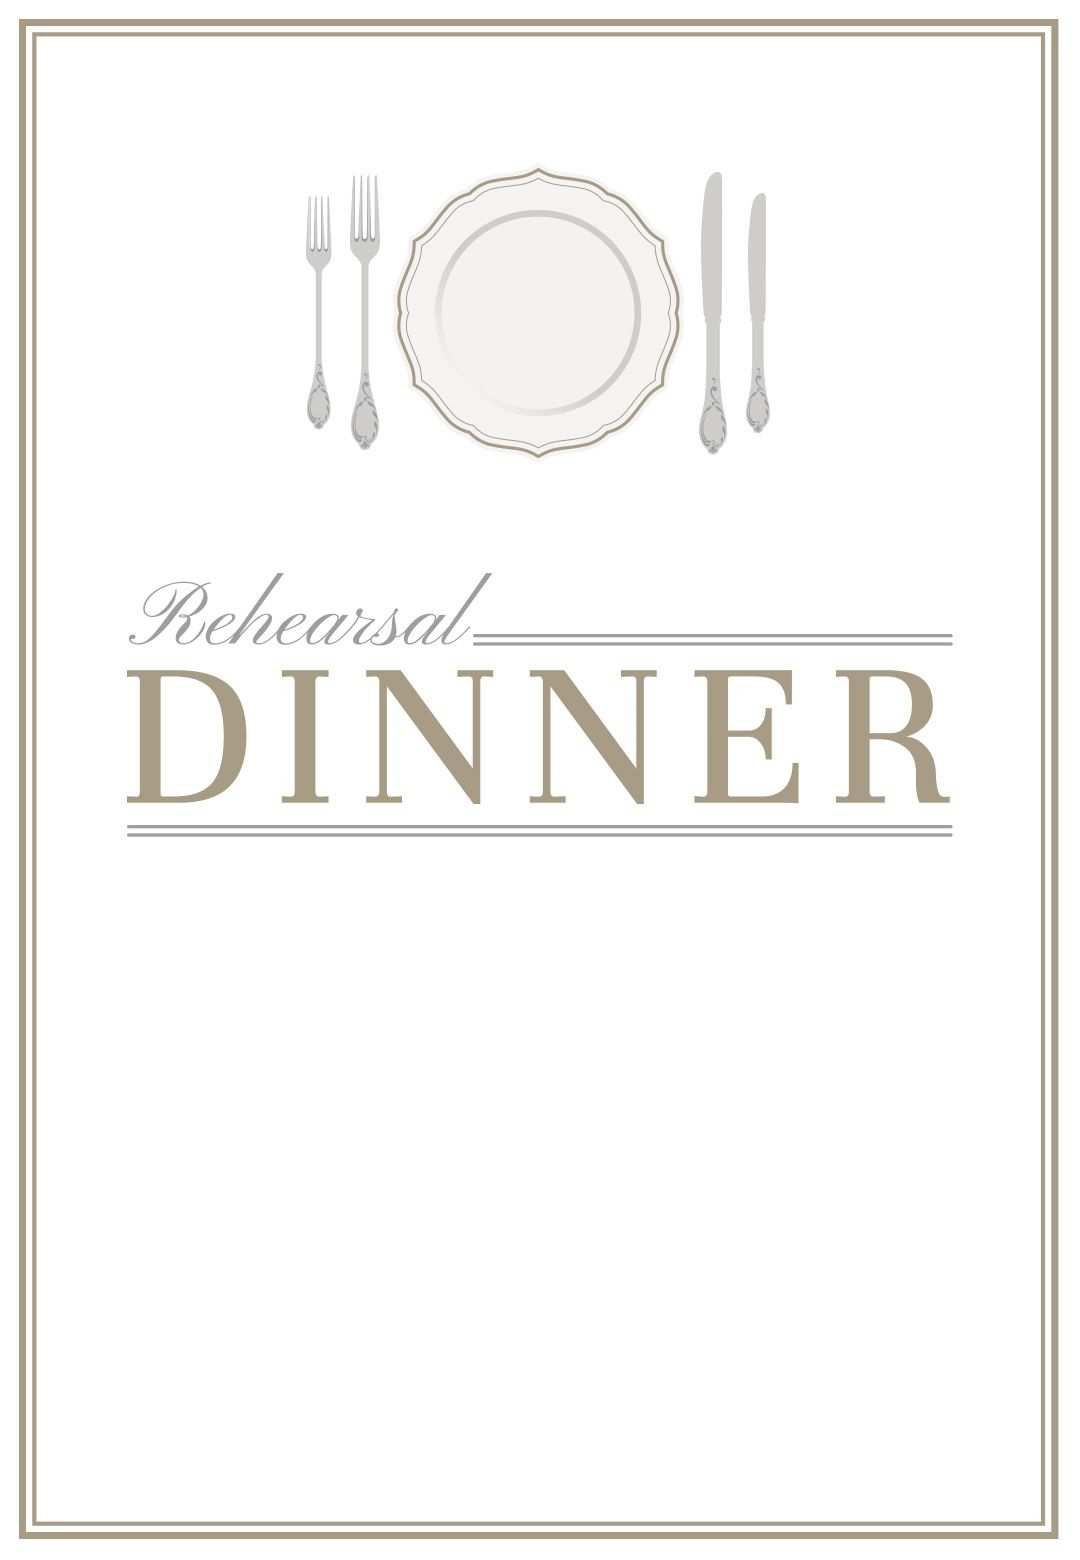 003 Remarkable Free Dinner Invitation Template Picture  Templates Rehearsal Printable Italian ThanksgivingFull